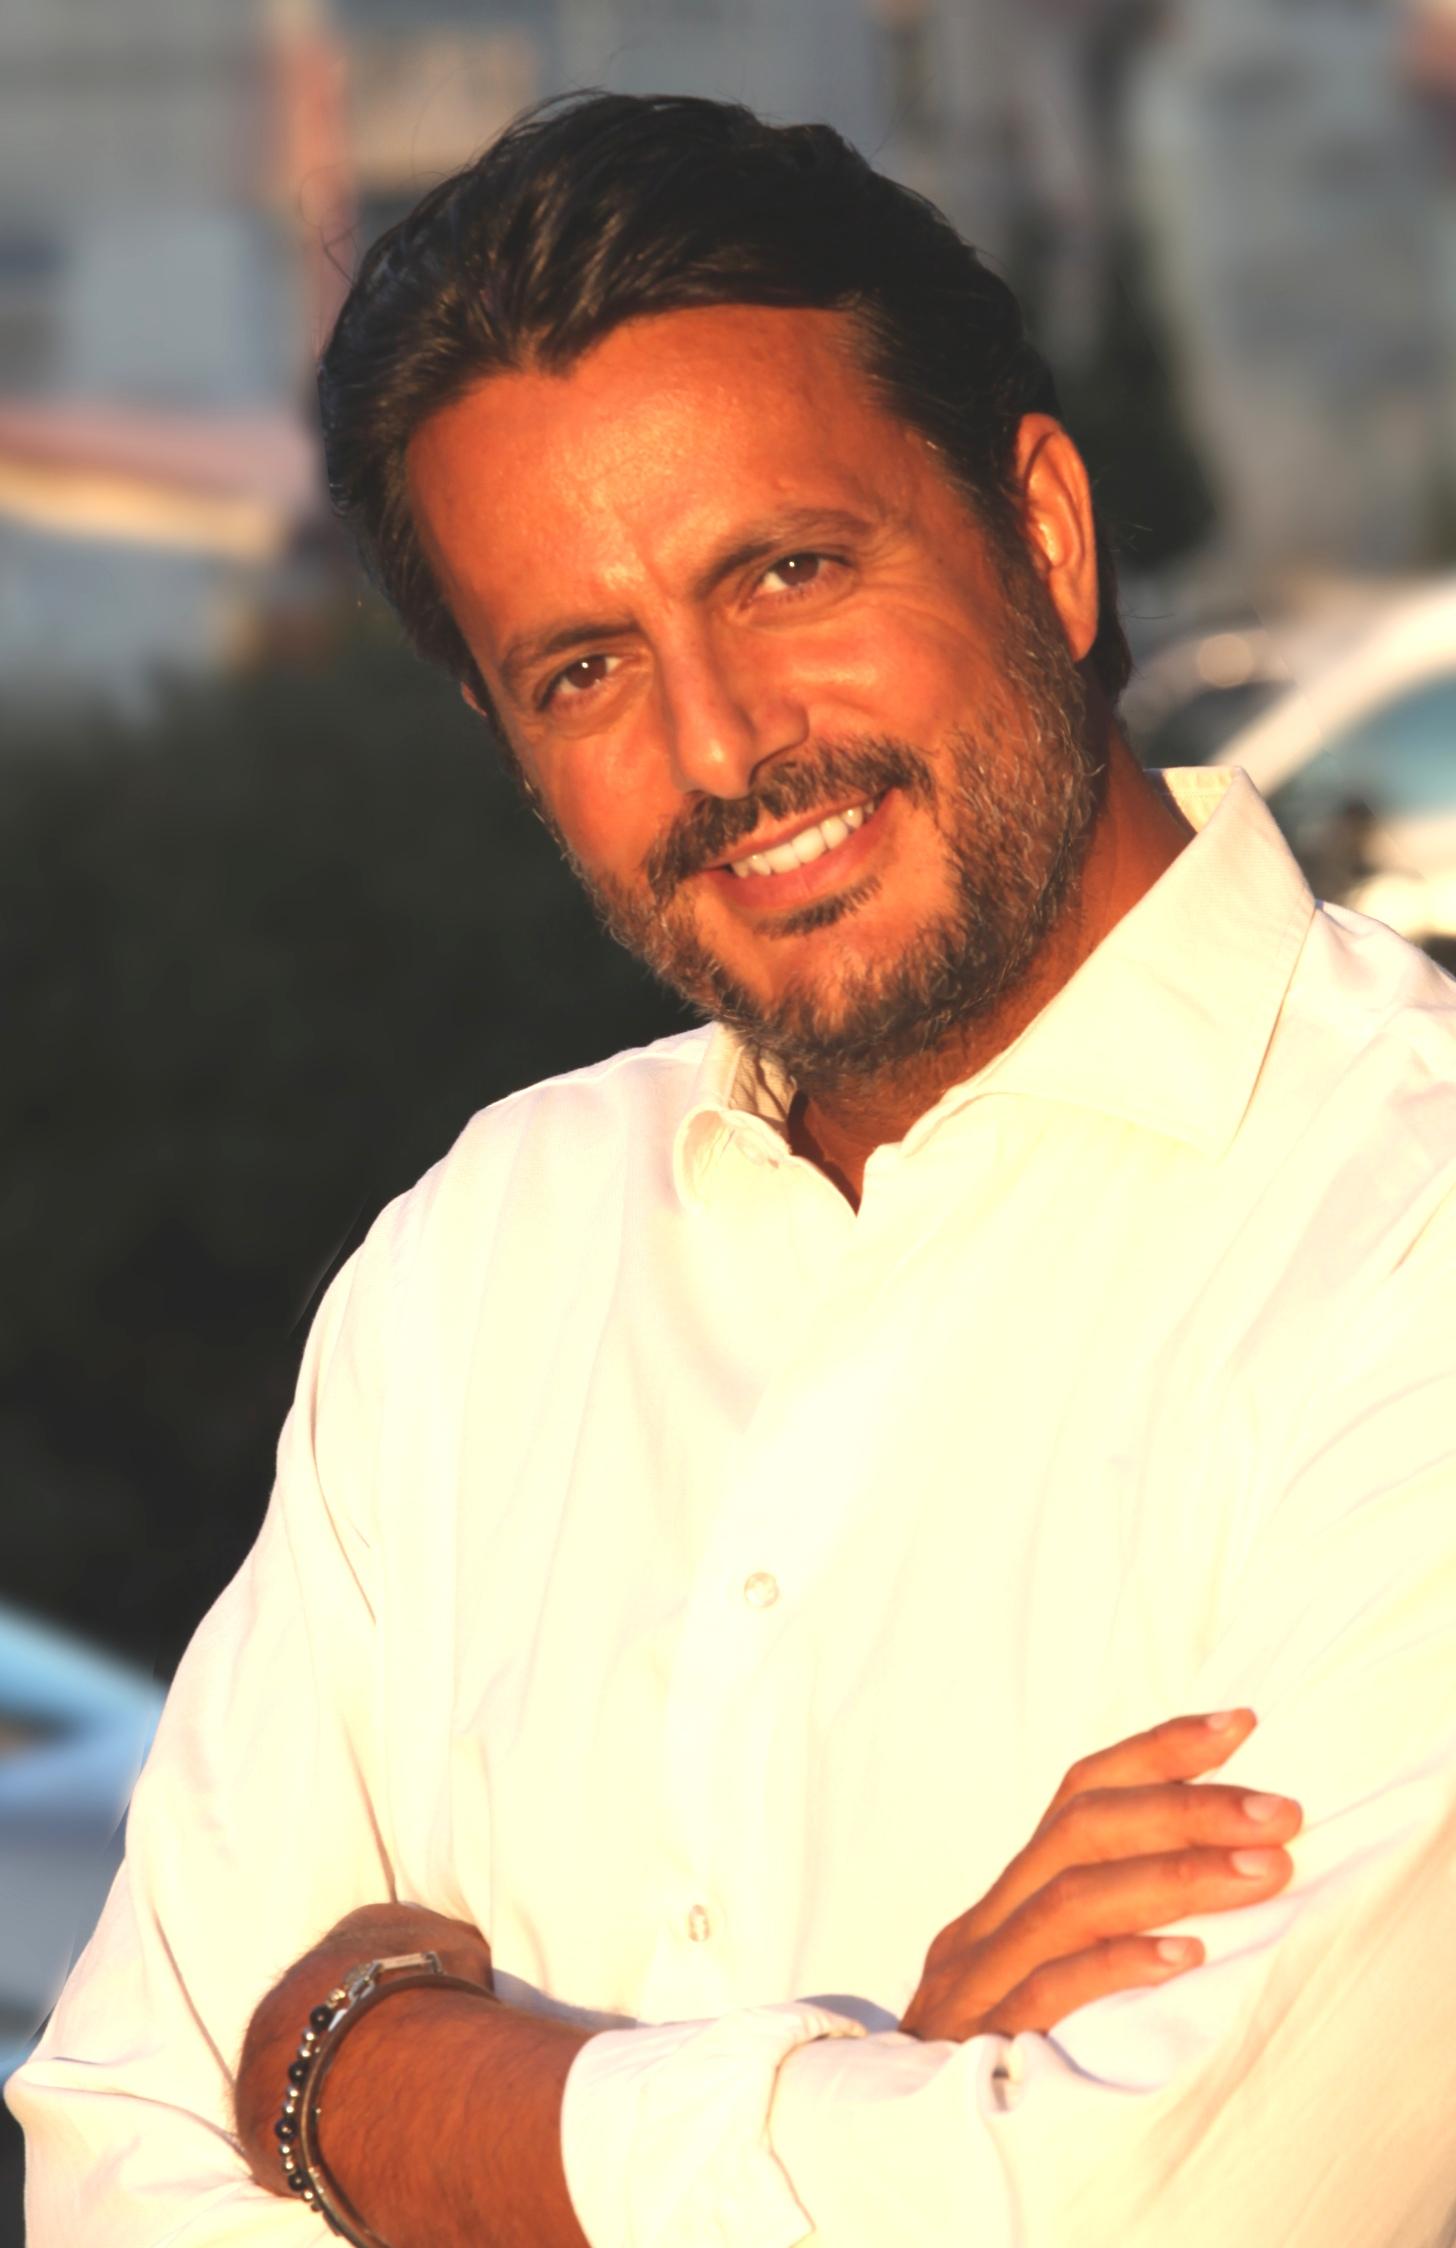 Maurizio Cuppone